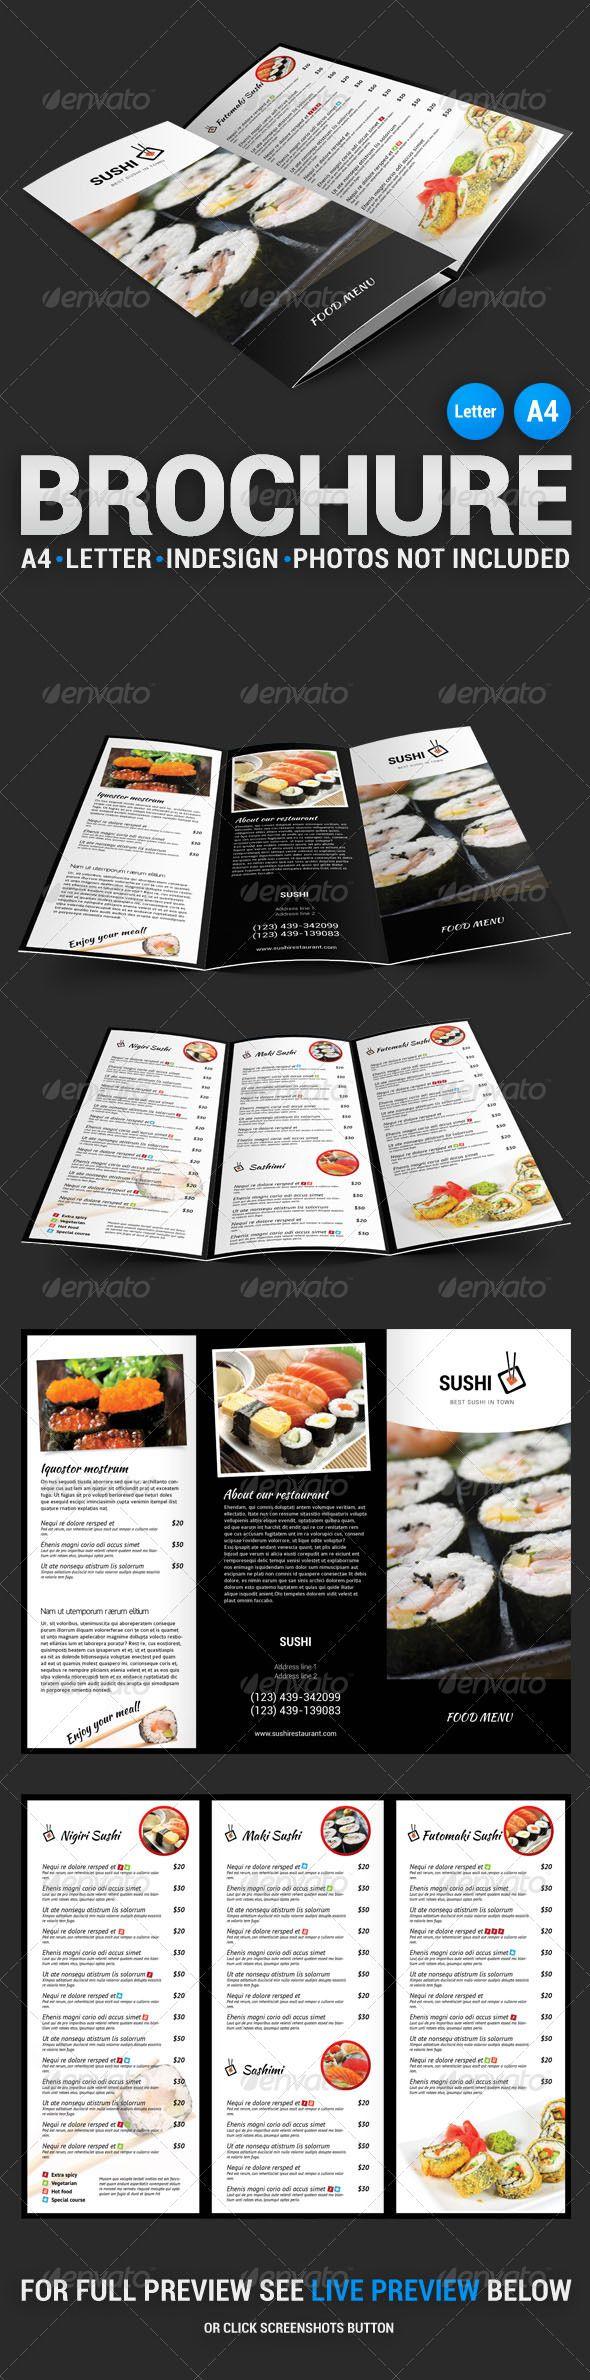 Best images about menu on pinterest font logo